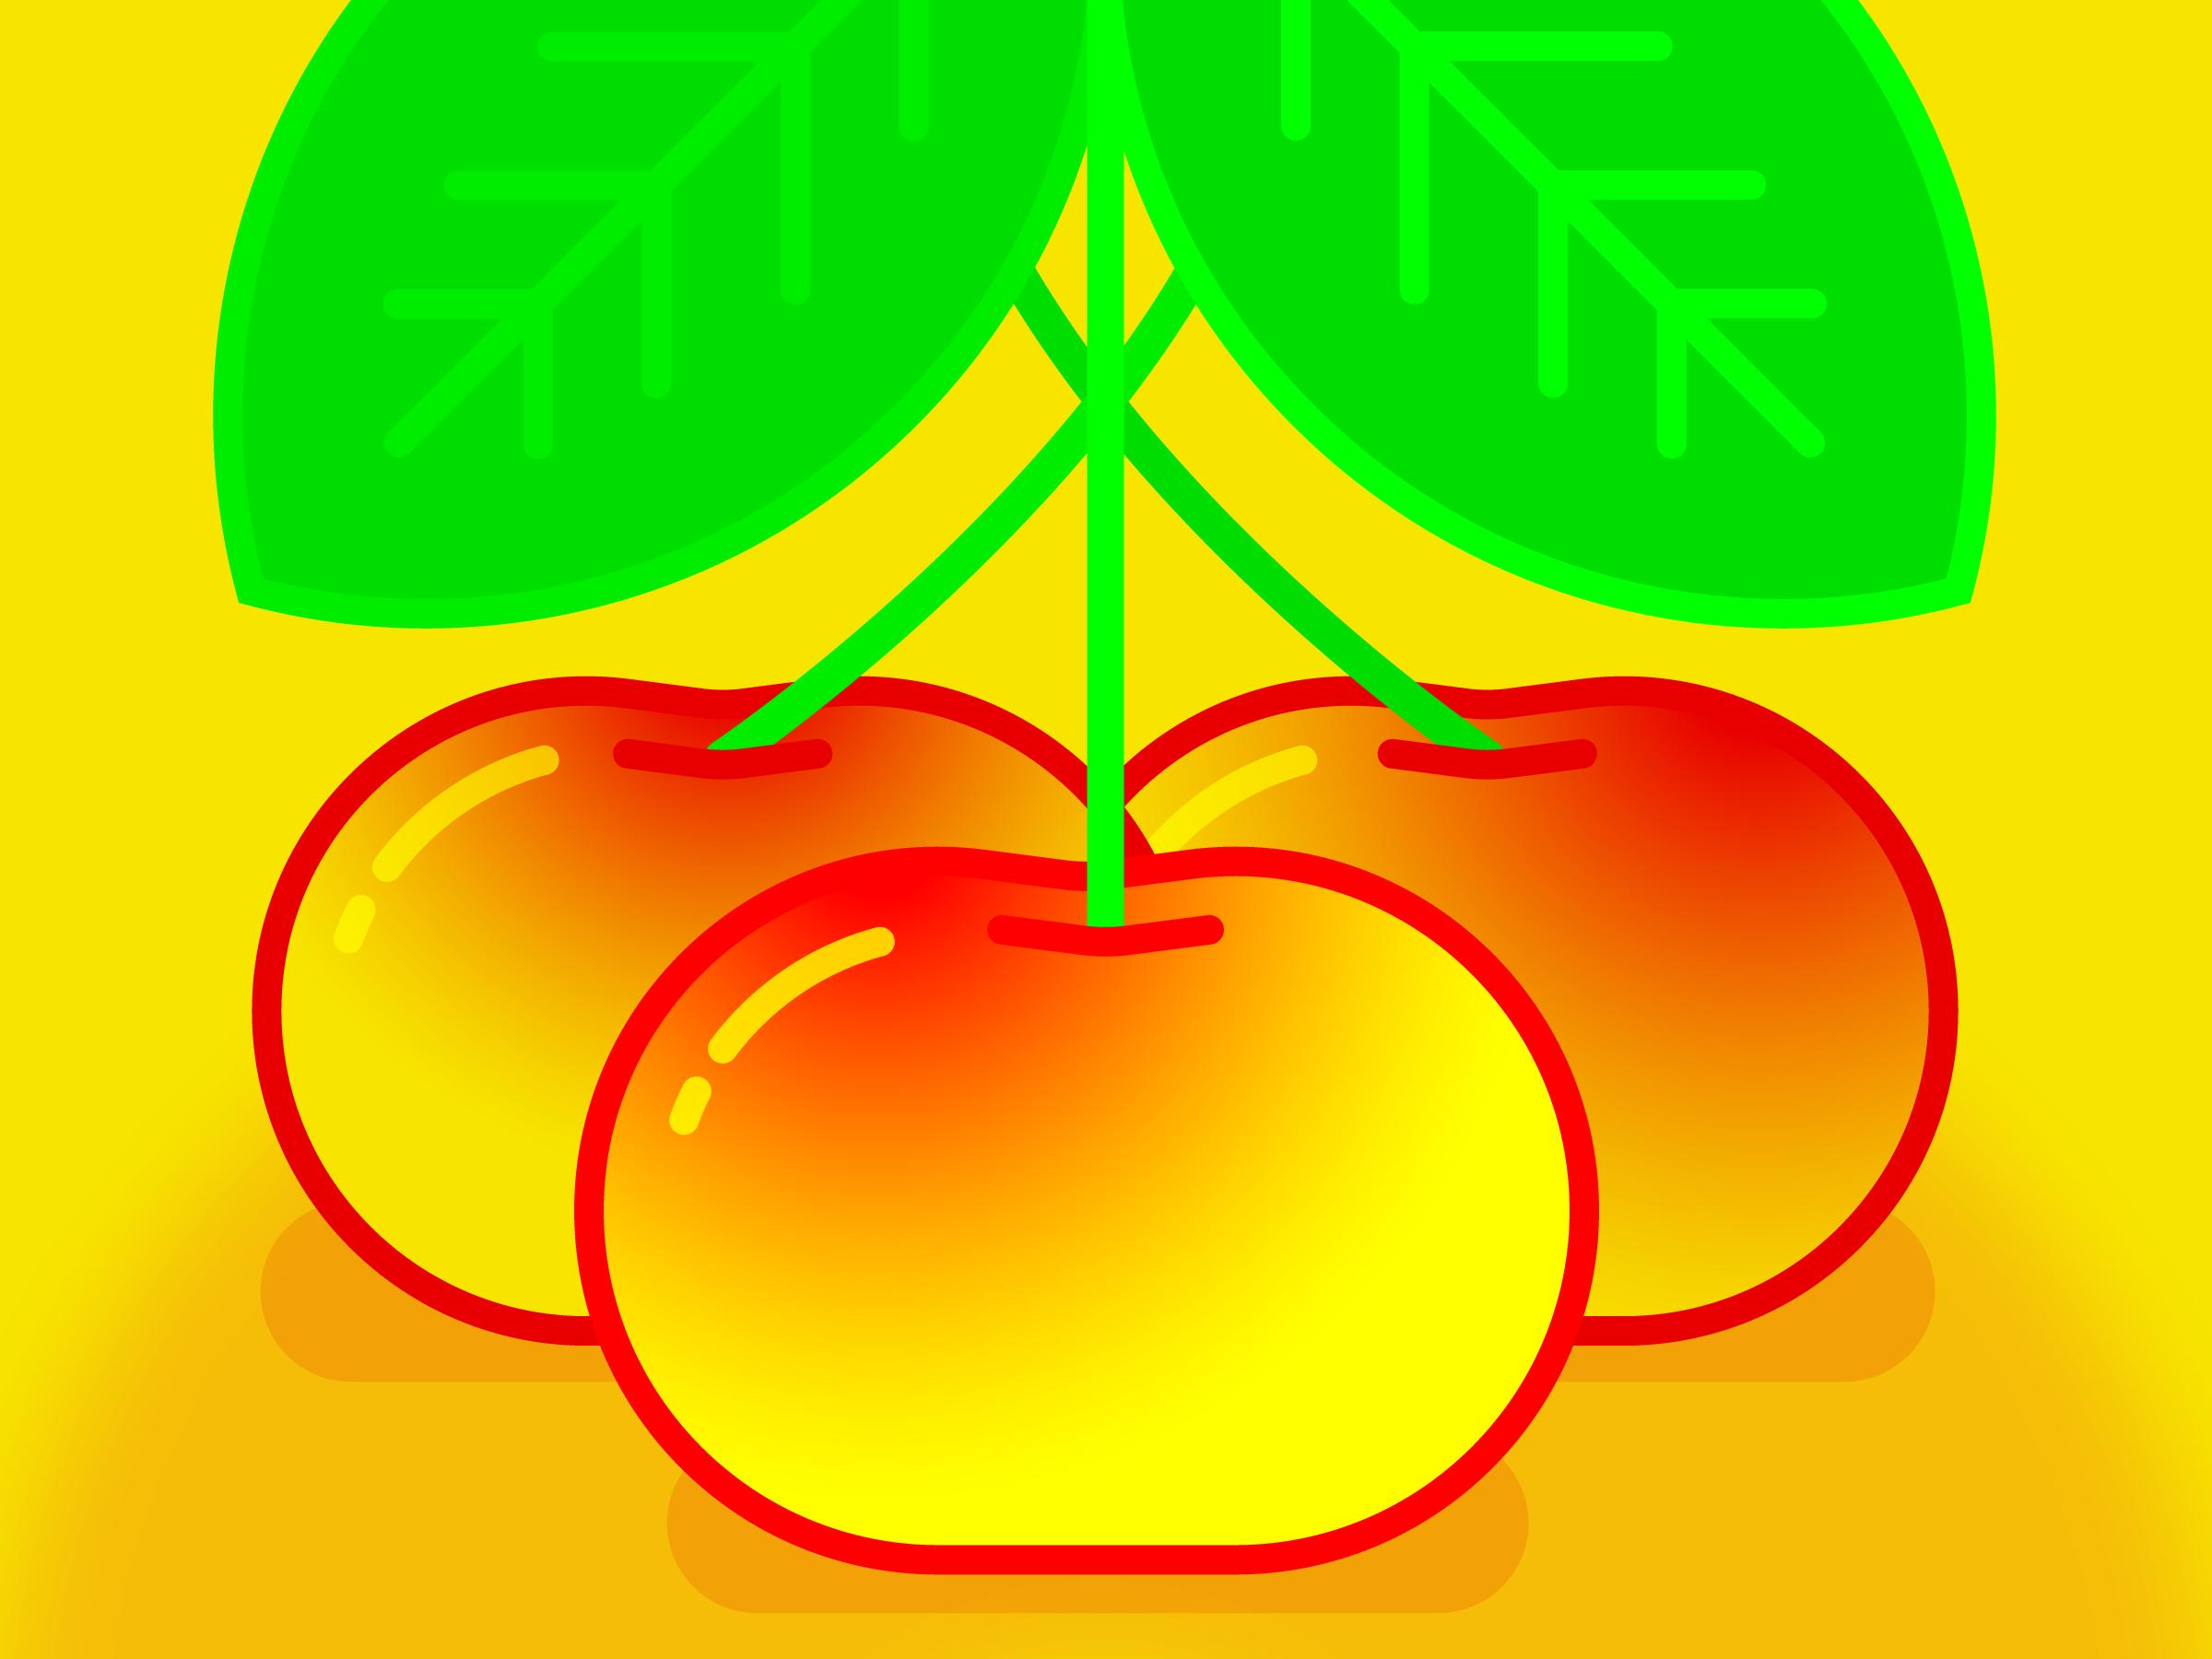 cherries-wide-01.png